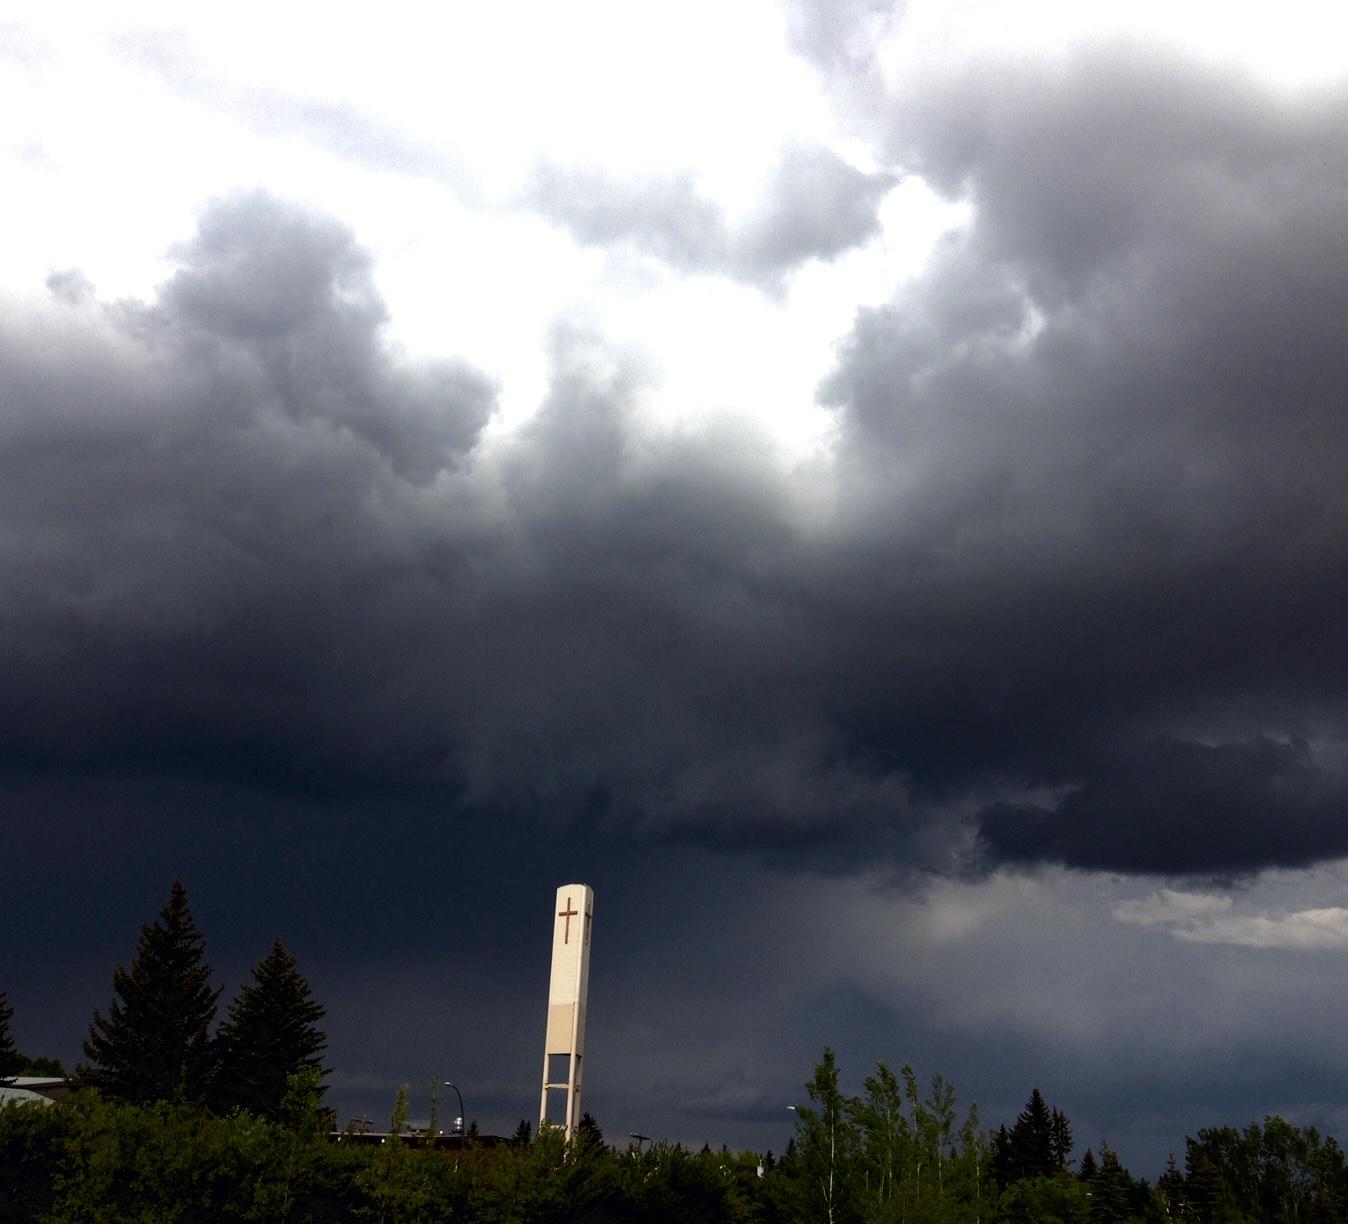 Approaching storm, Altadore, Calgary